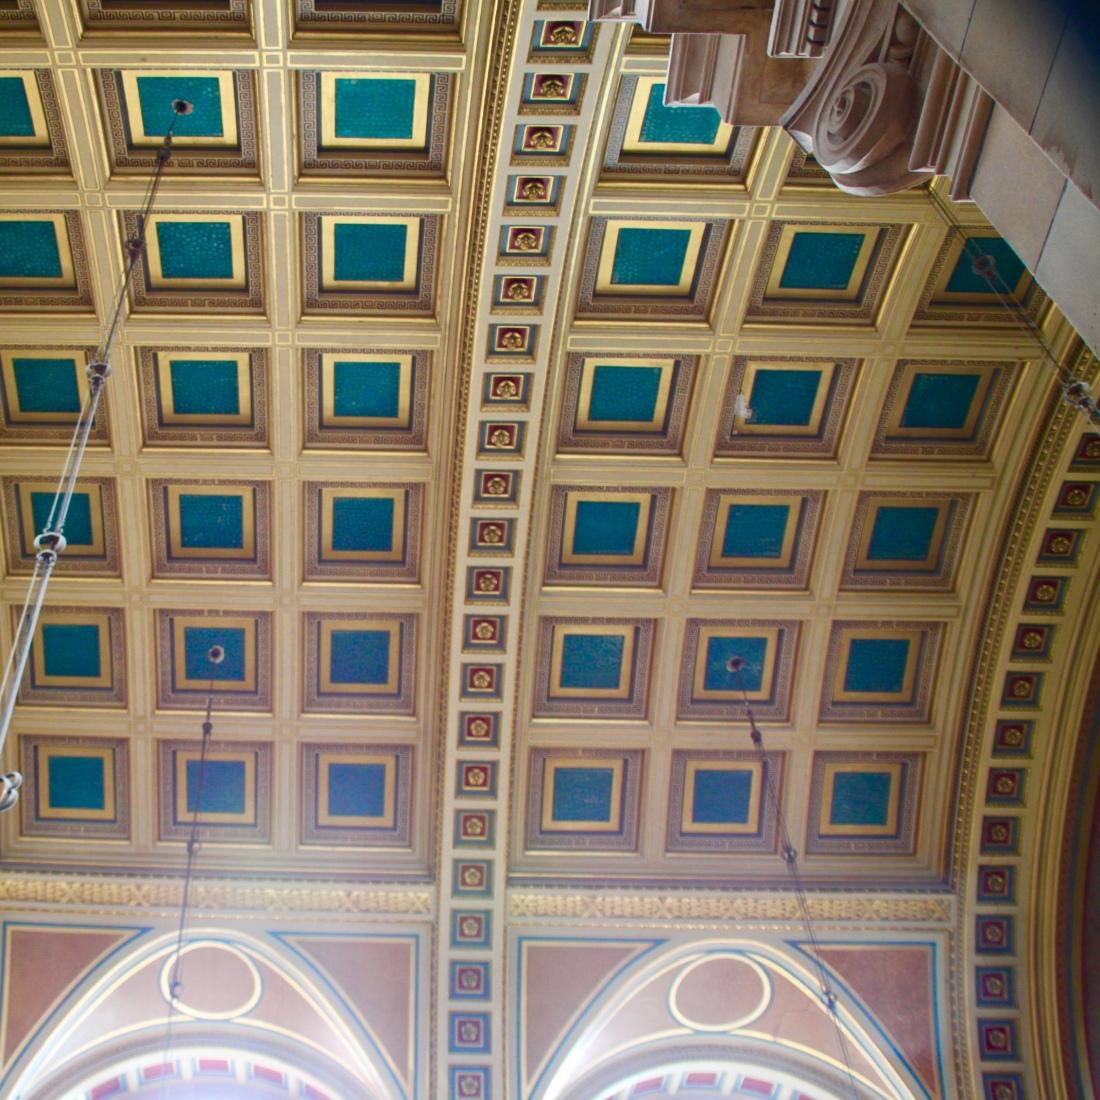 Kelvingrove Art Gallery and Museum vaulted ceiling, Glasgow, by Jez Braithwaite